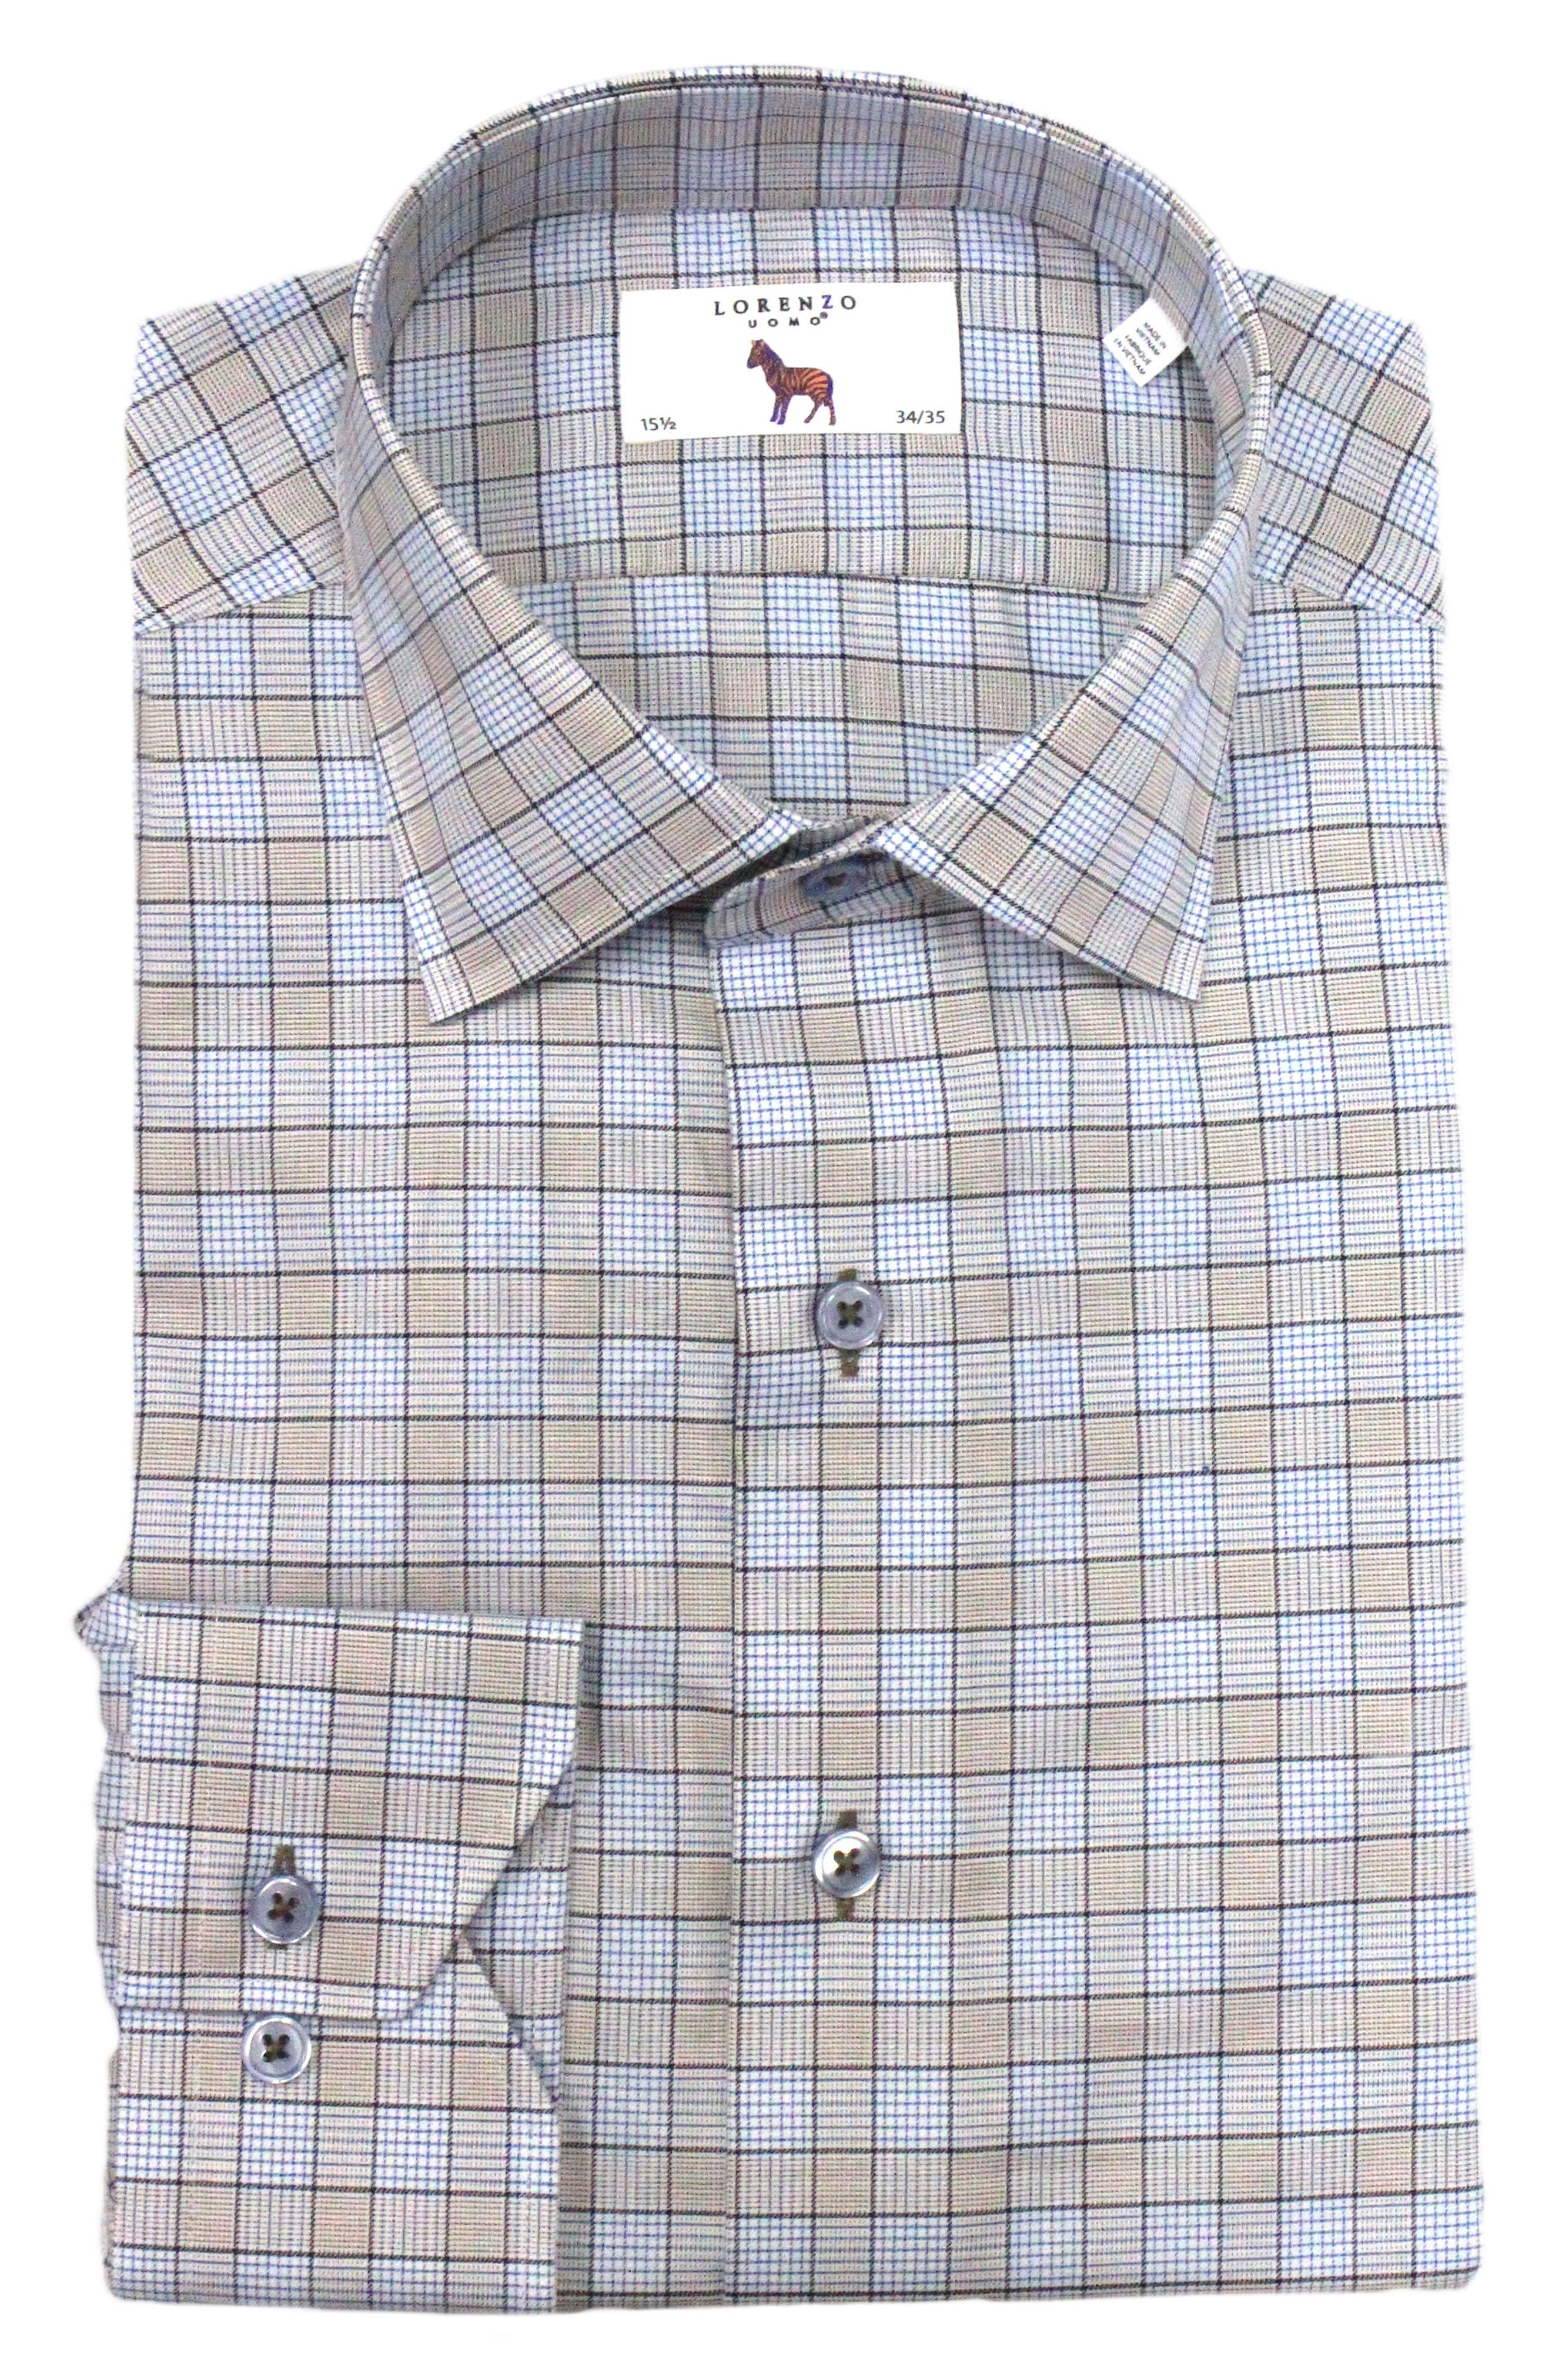 Trim Fit Box Check Dress Shirt,                         Main,                         color, Tan/ Light Blue